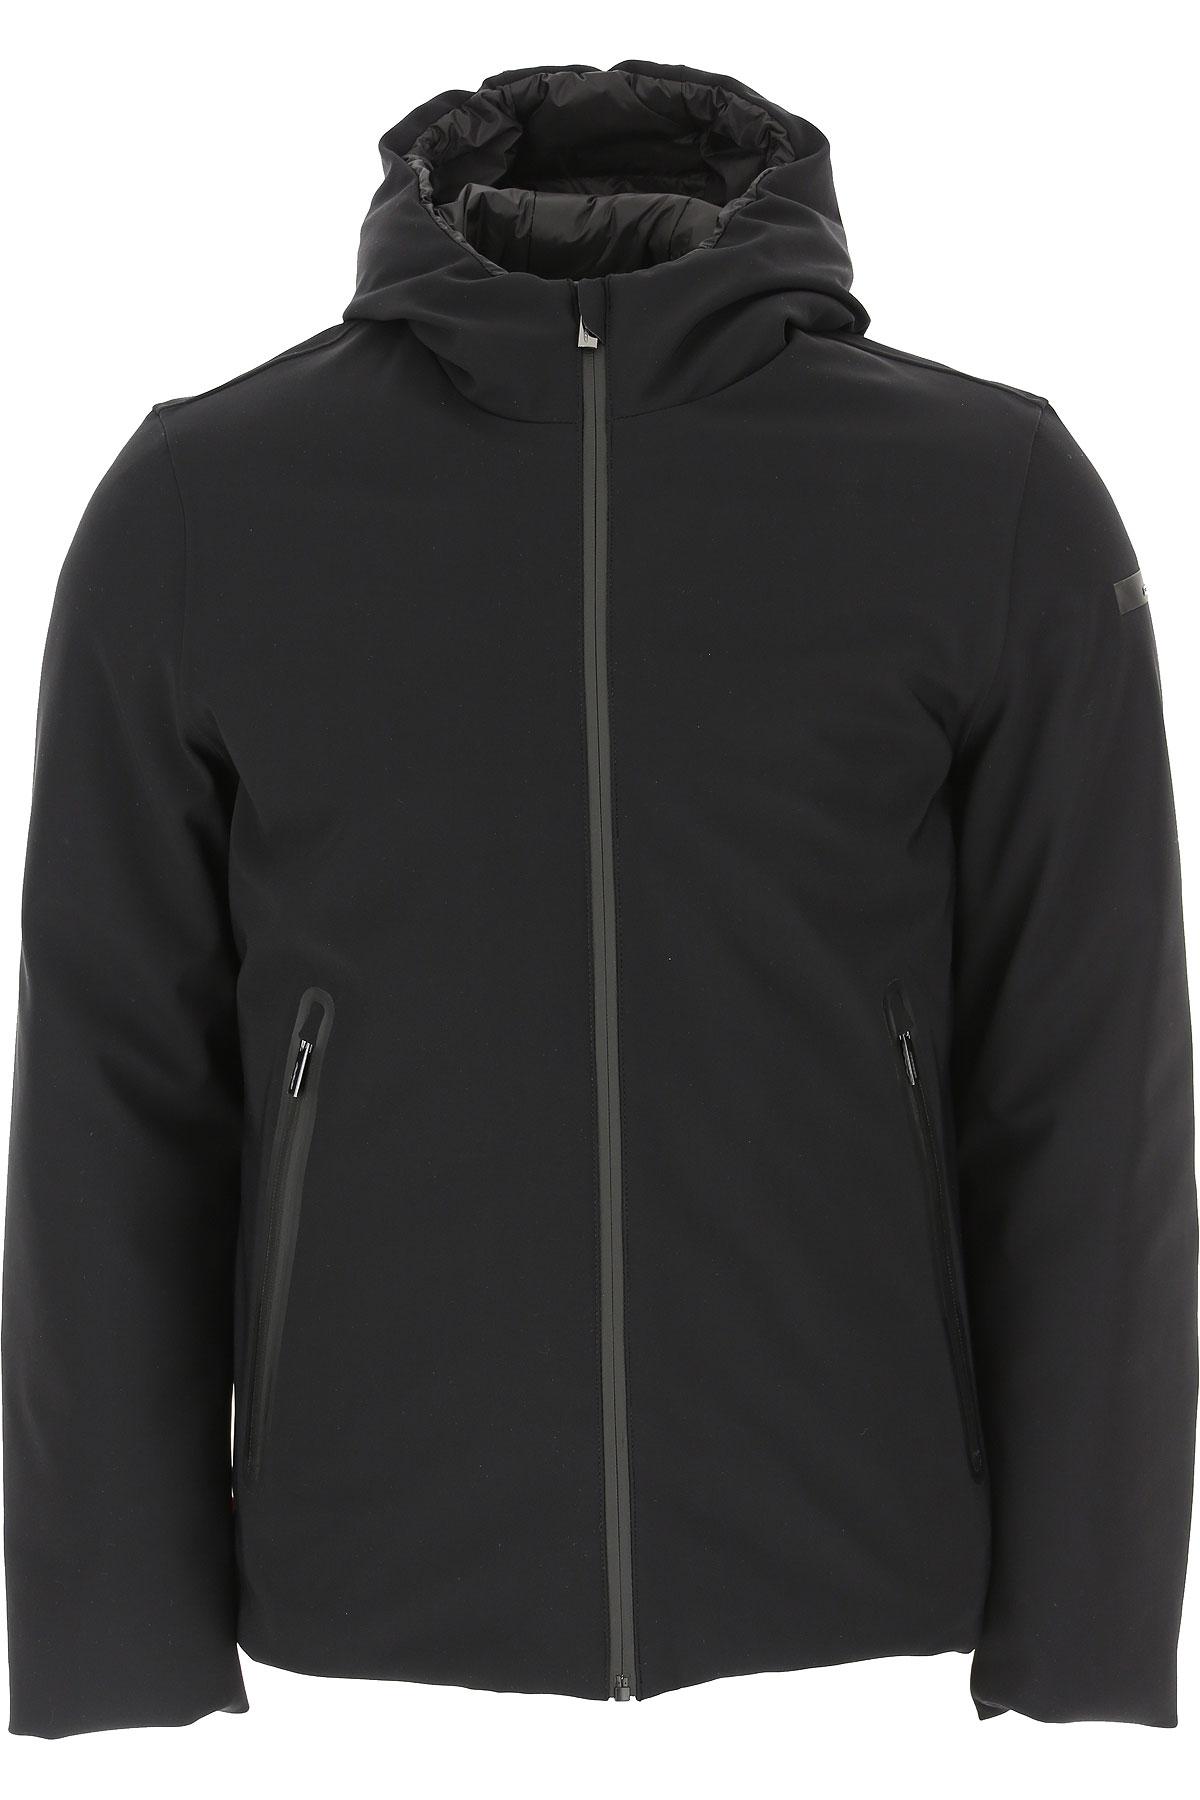 RRD Jacket for Men On Sale, Black, polyamide, 2019, L M S XL XXL XXXL